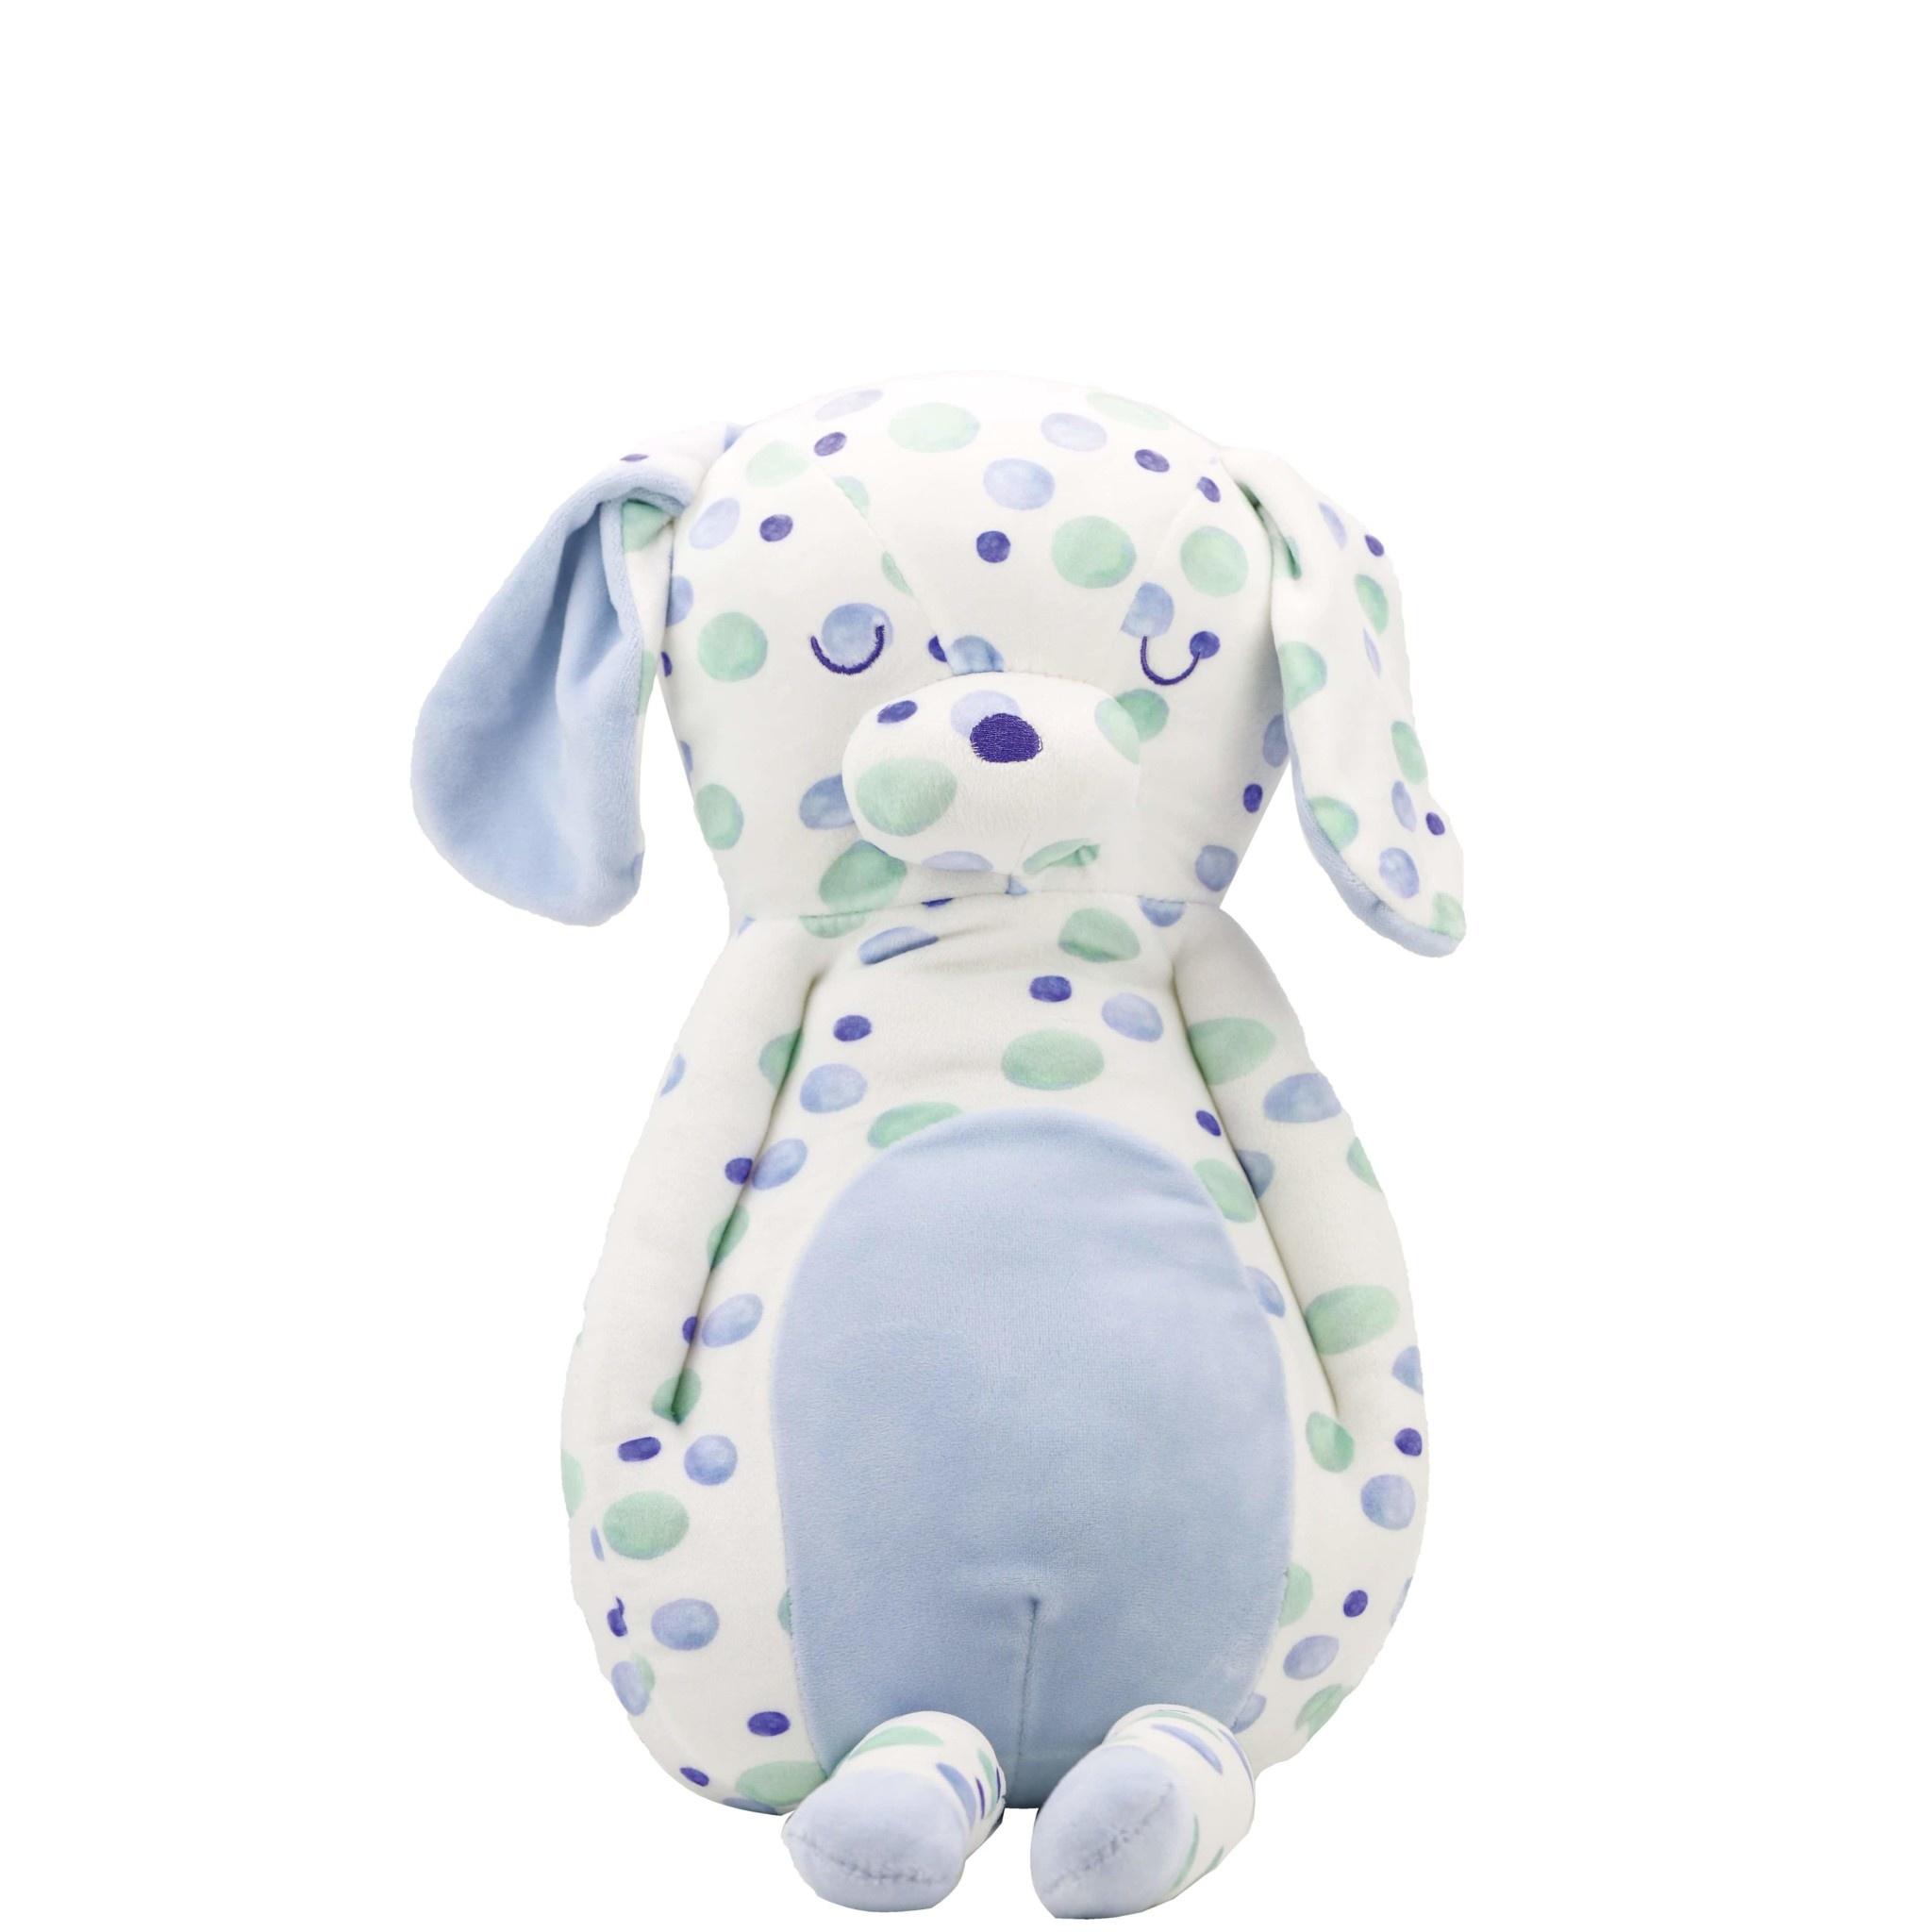 Goosewaddle Plush Puppy-Oxford